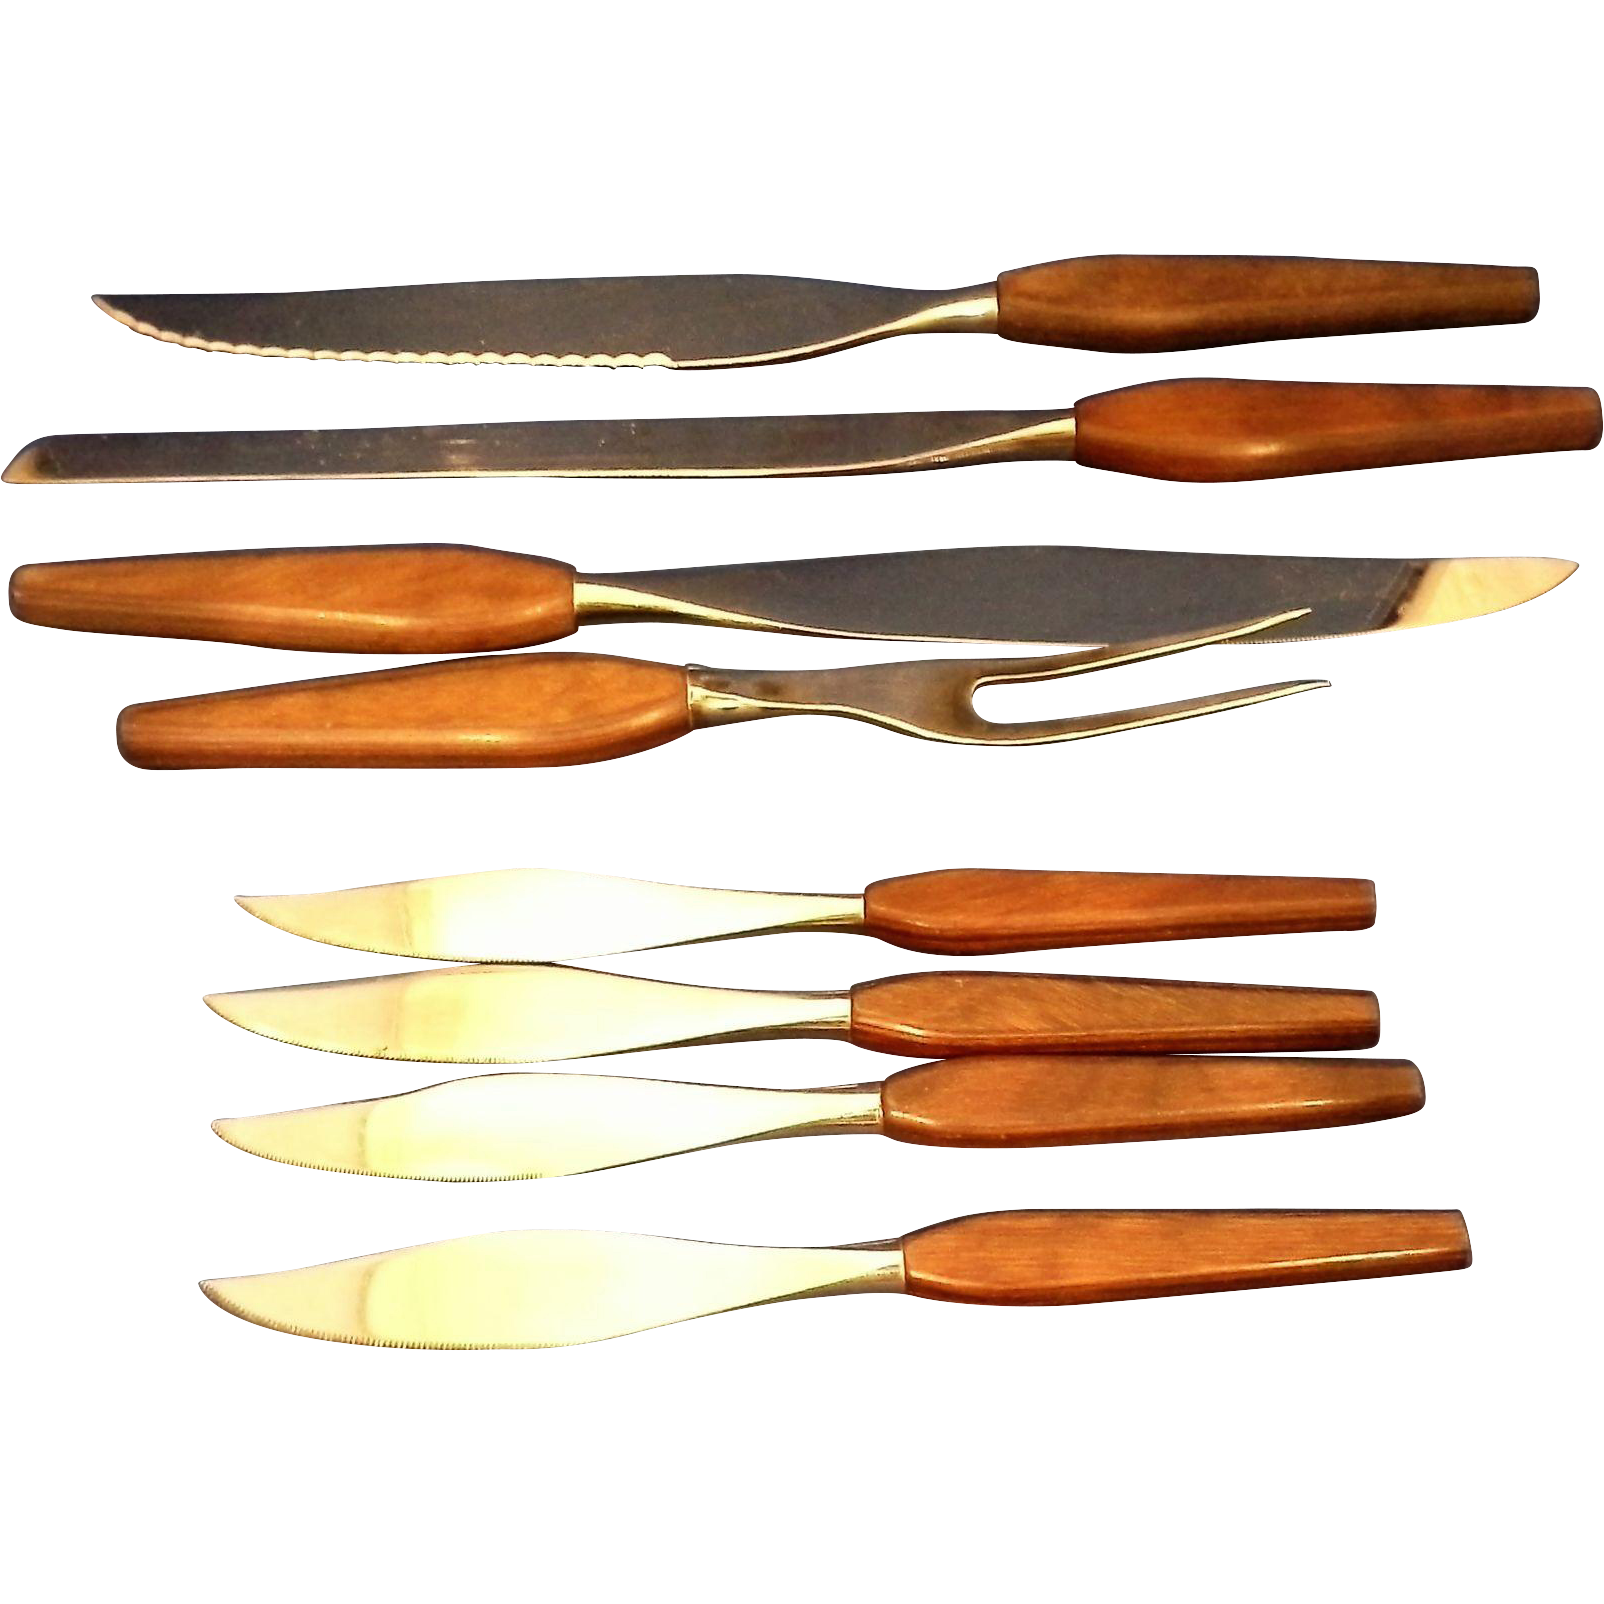 Mid Century Danish Modern 1960s Knives Set Wooden Handles 12 Pcs